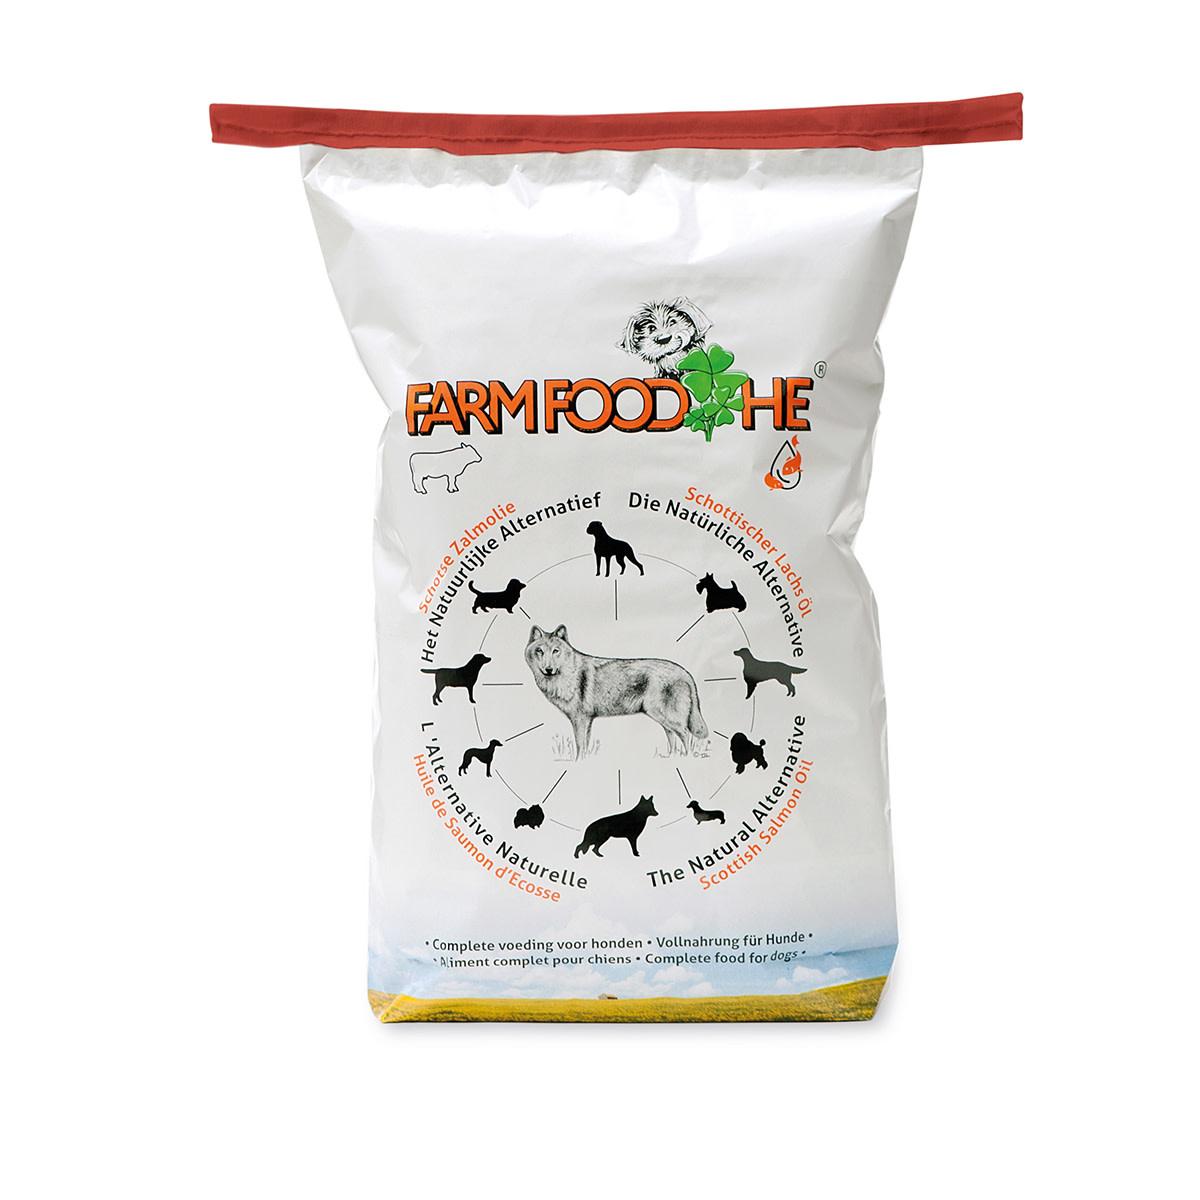 FarmFood FARM FOOD- Schotse Zalmolie